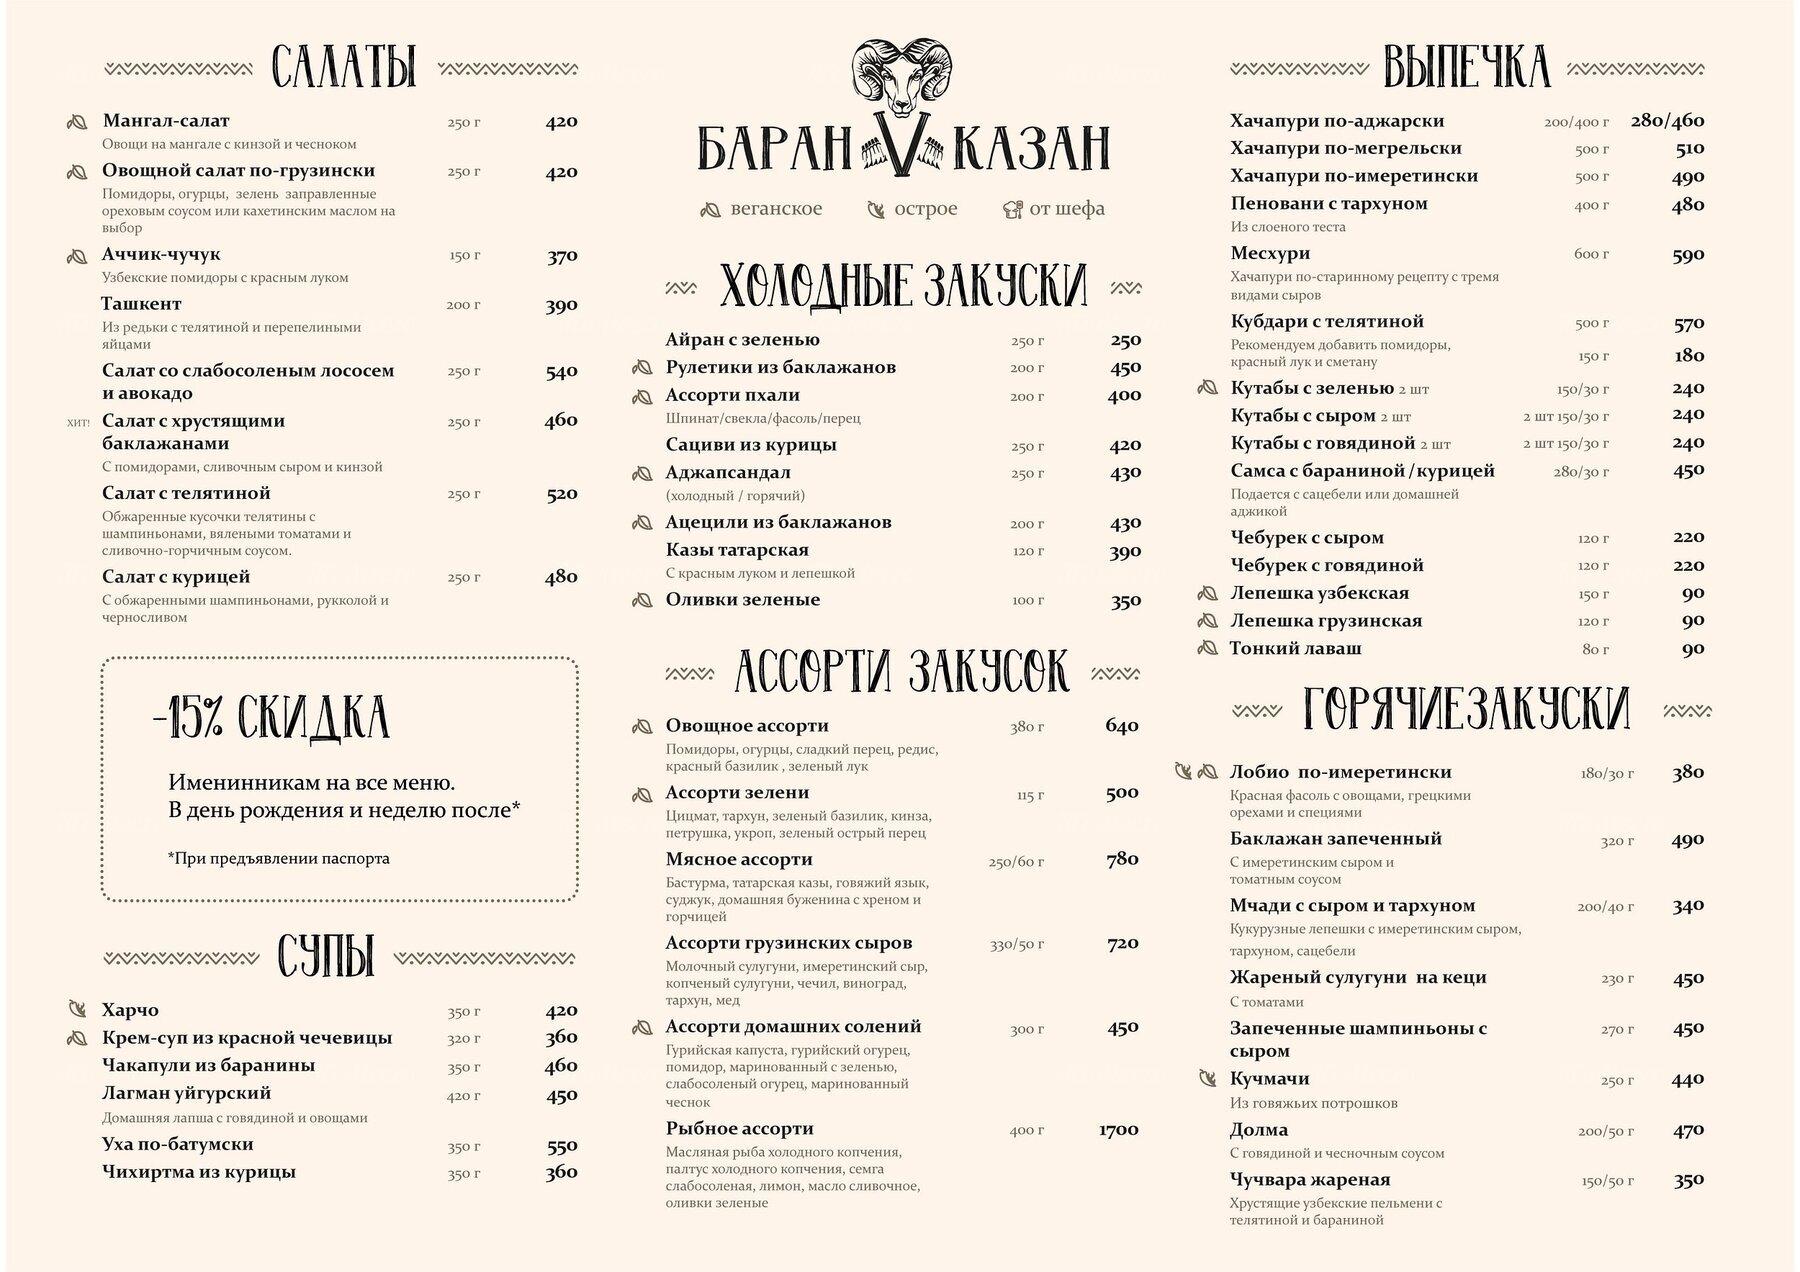 Меню ресторана Баран в Казан на Марксистской фото 1